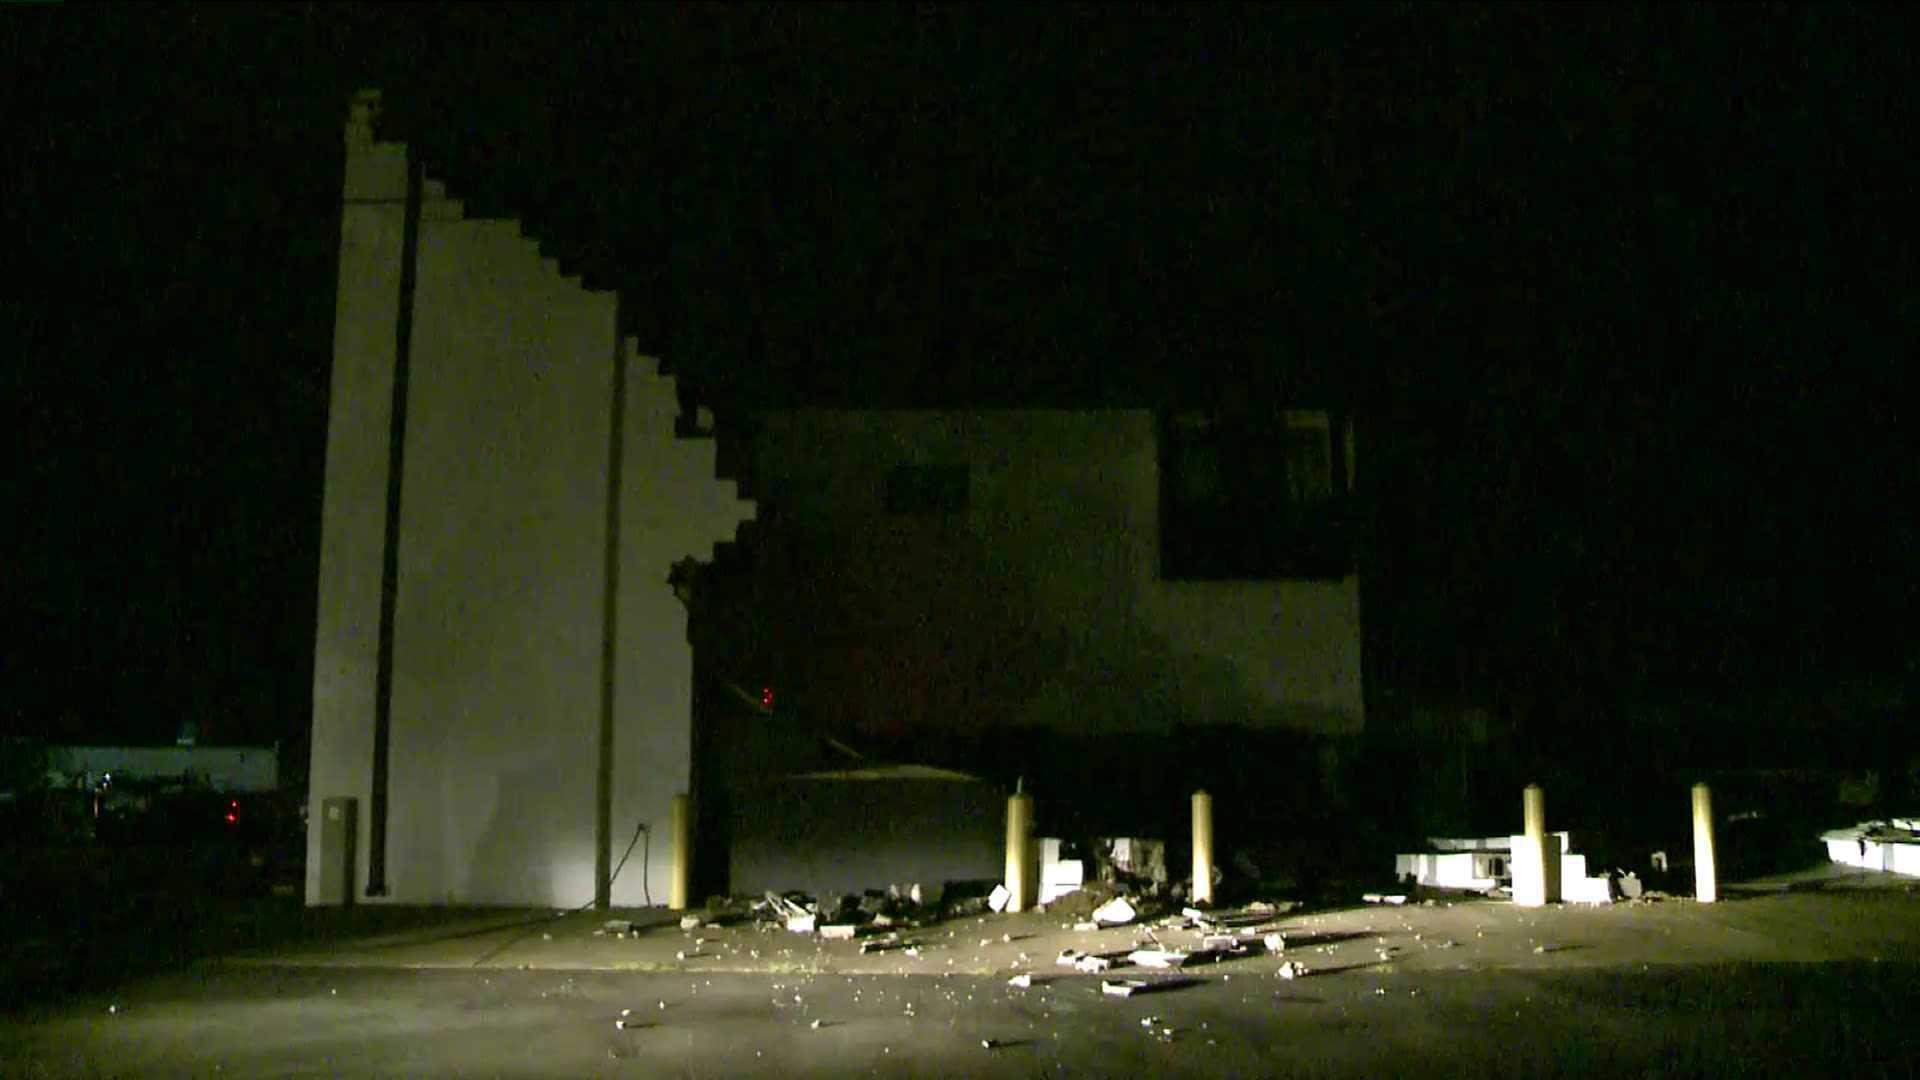 Photos: Severe winds hit Spotsylvania, collapse twobuildings